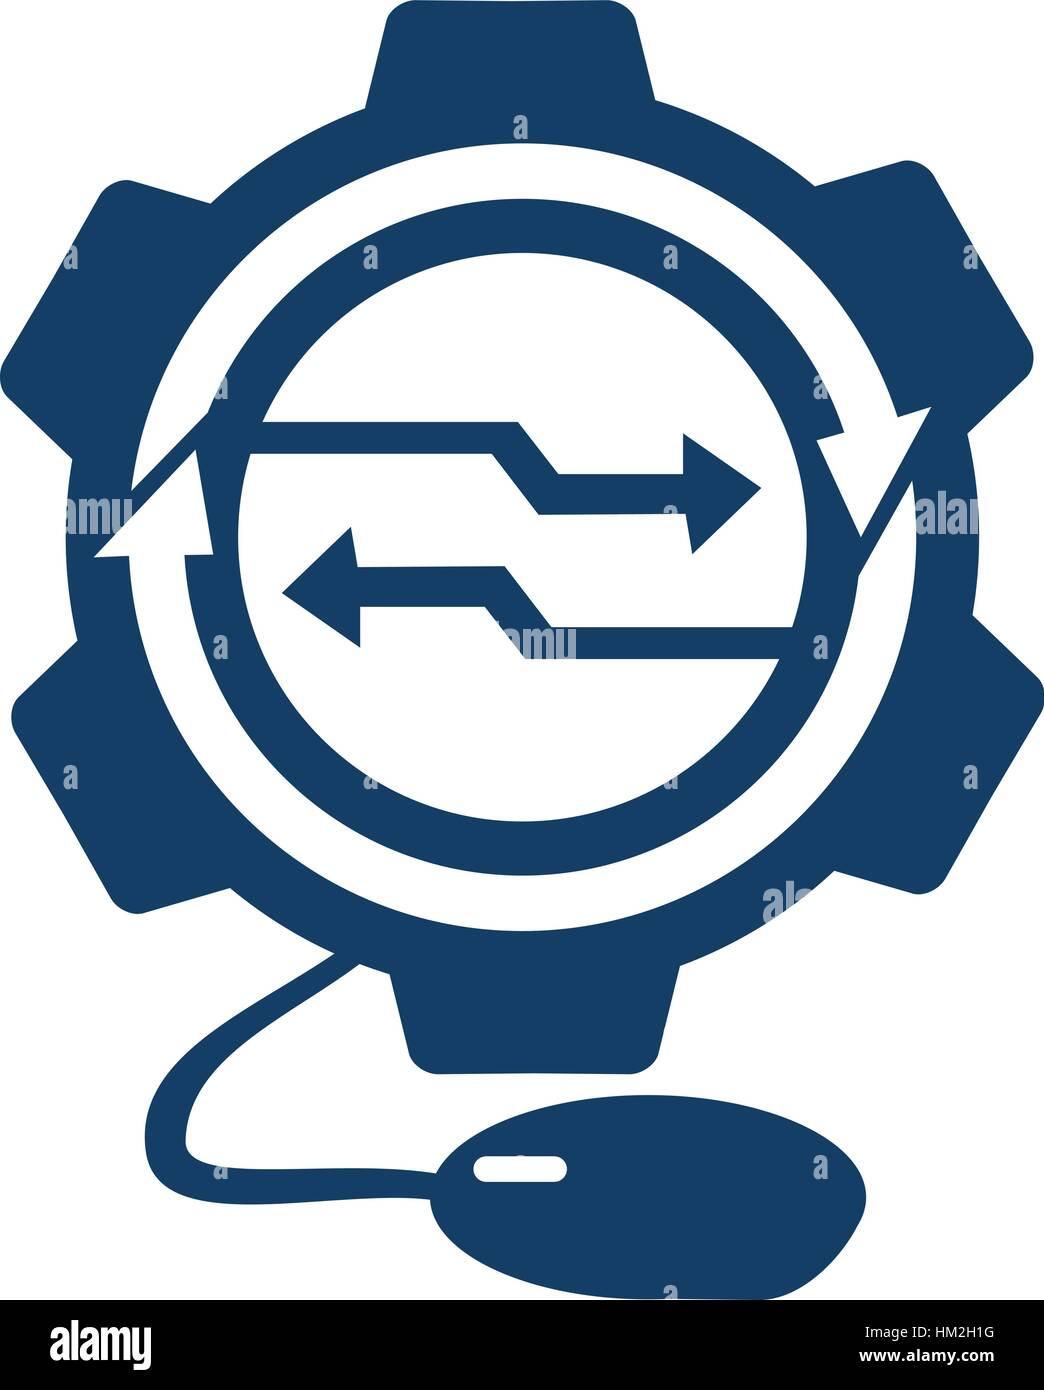 Digital Technology - Stock Image